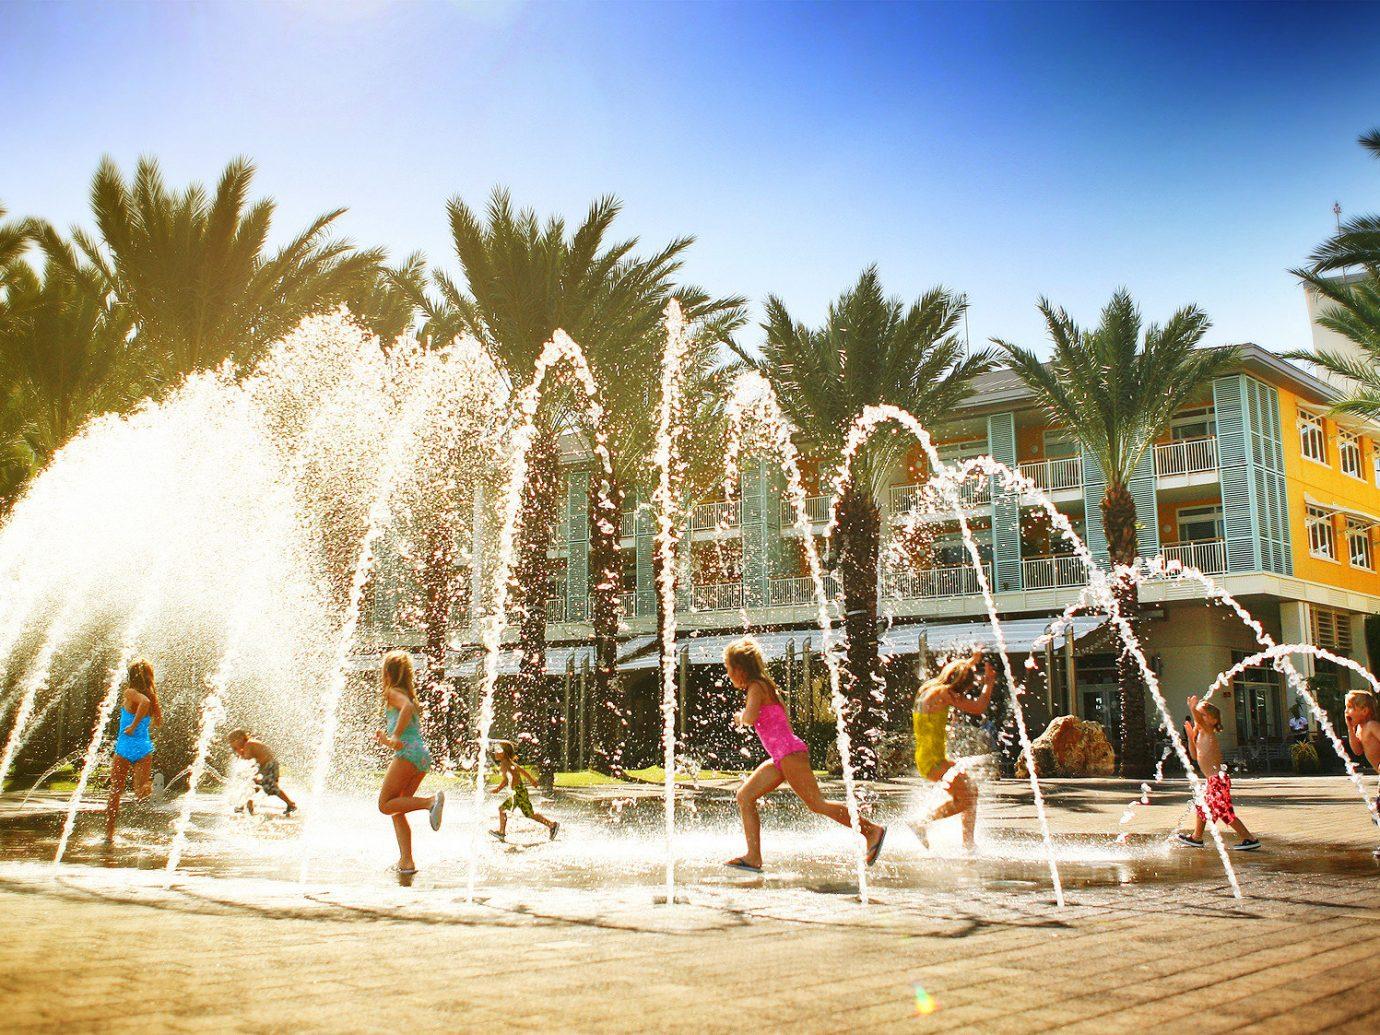 Trip Ideas tree outdoor sky amusement park arecales Resort fountain water feature park